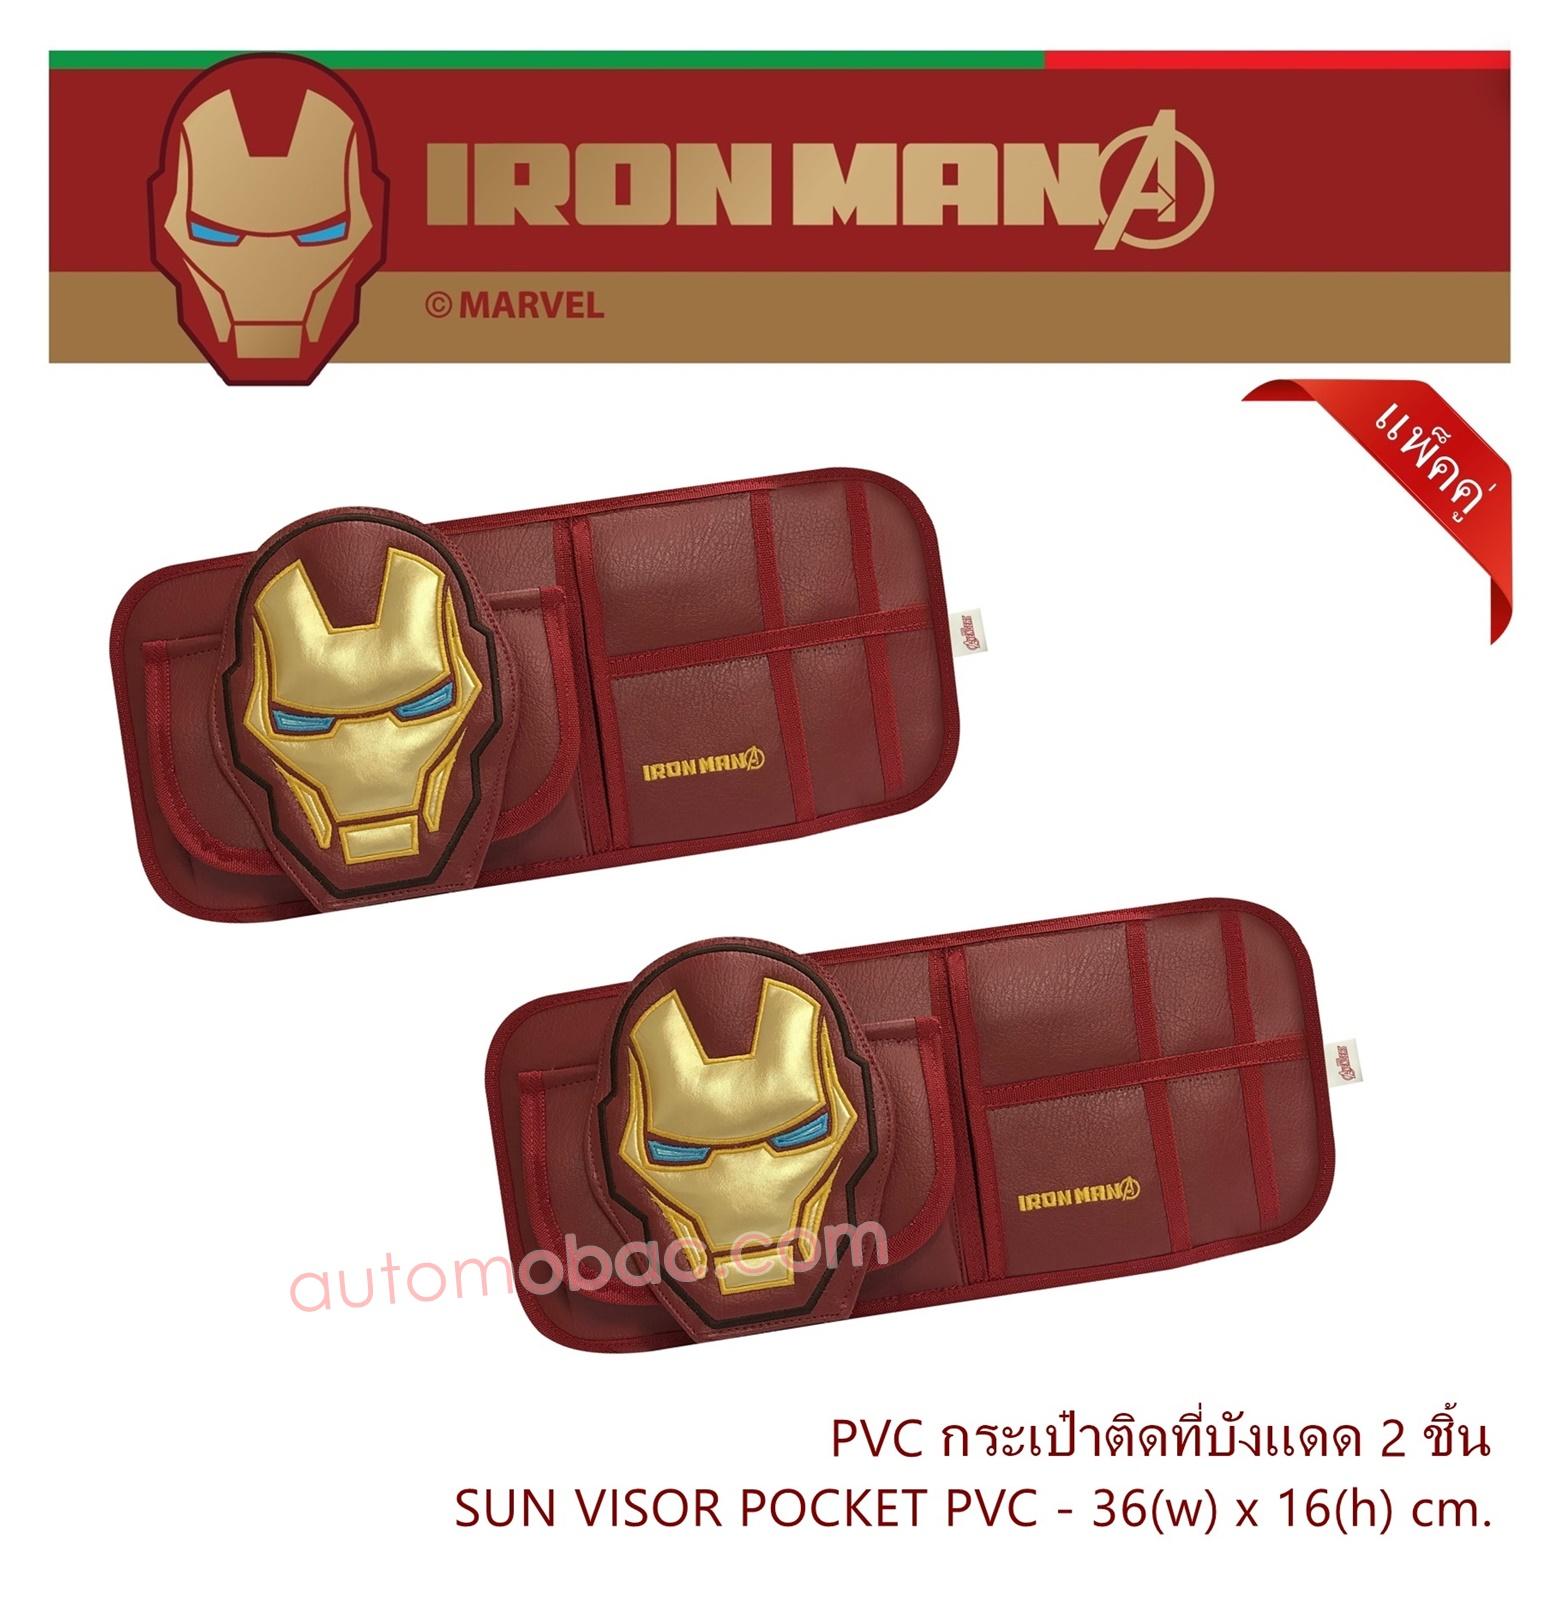 IRON-MAN กระเป๋าติดที่บังแดด 2 ชิ้น หนัง PVC มีที่ใส่แว่นตา และนามบัตร จัดระเบียบ หยิบใช้สะดวก  ทำ